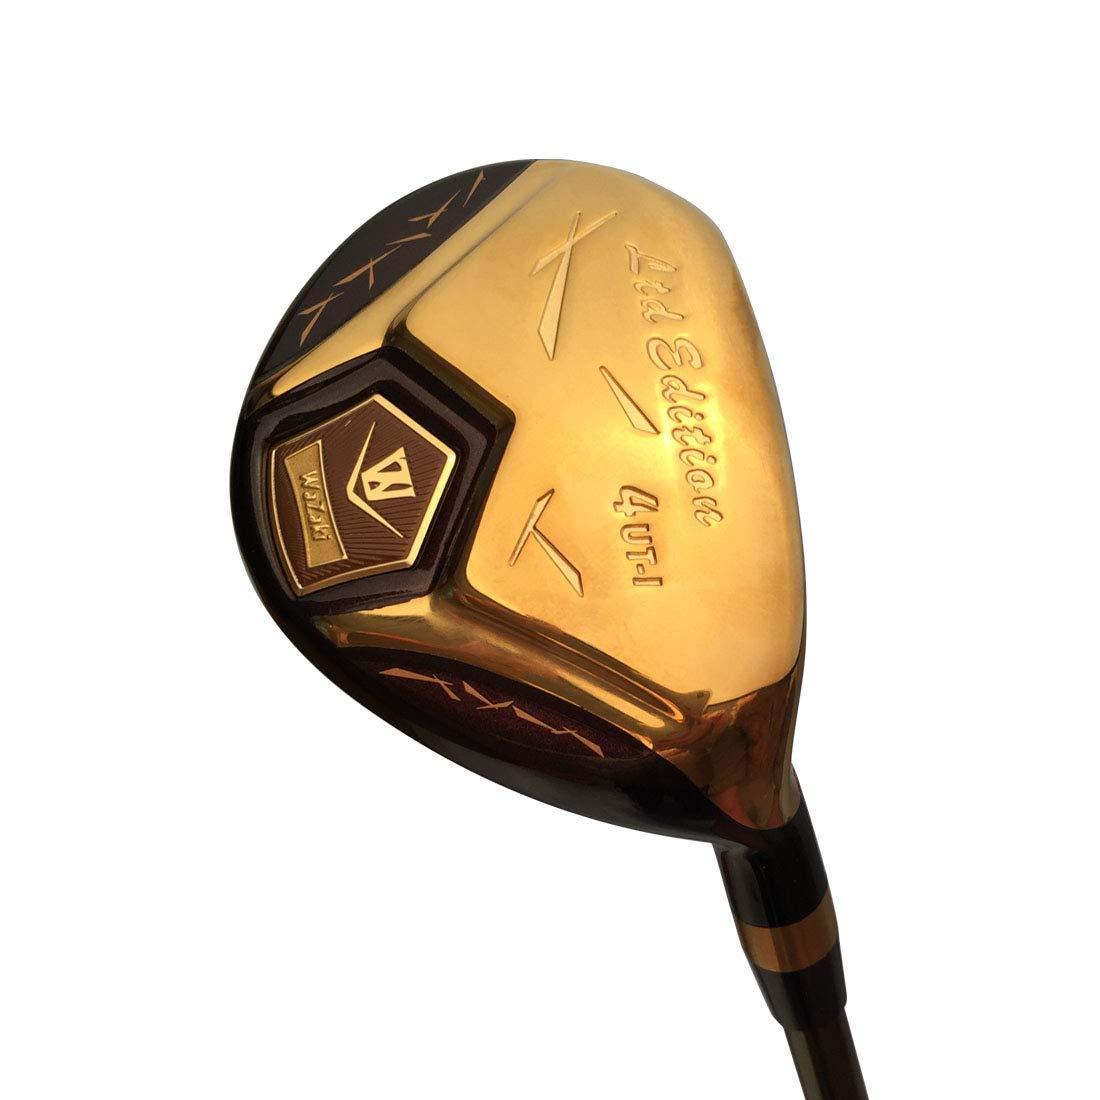 Japan WaZaki 14K Gold Finish Cyclone 4-SW Mx Steel Hybrid Irons Golf Club Set Headcover Regular Flex,Gold Graphite Shaft,Right Handed,Pack of 16